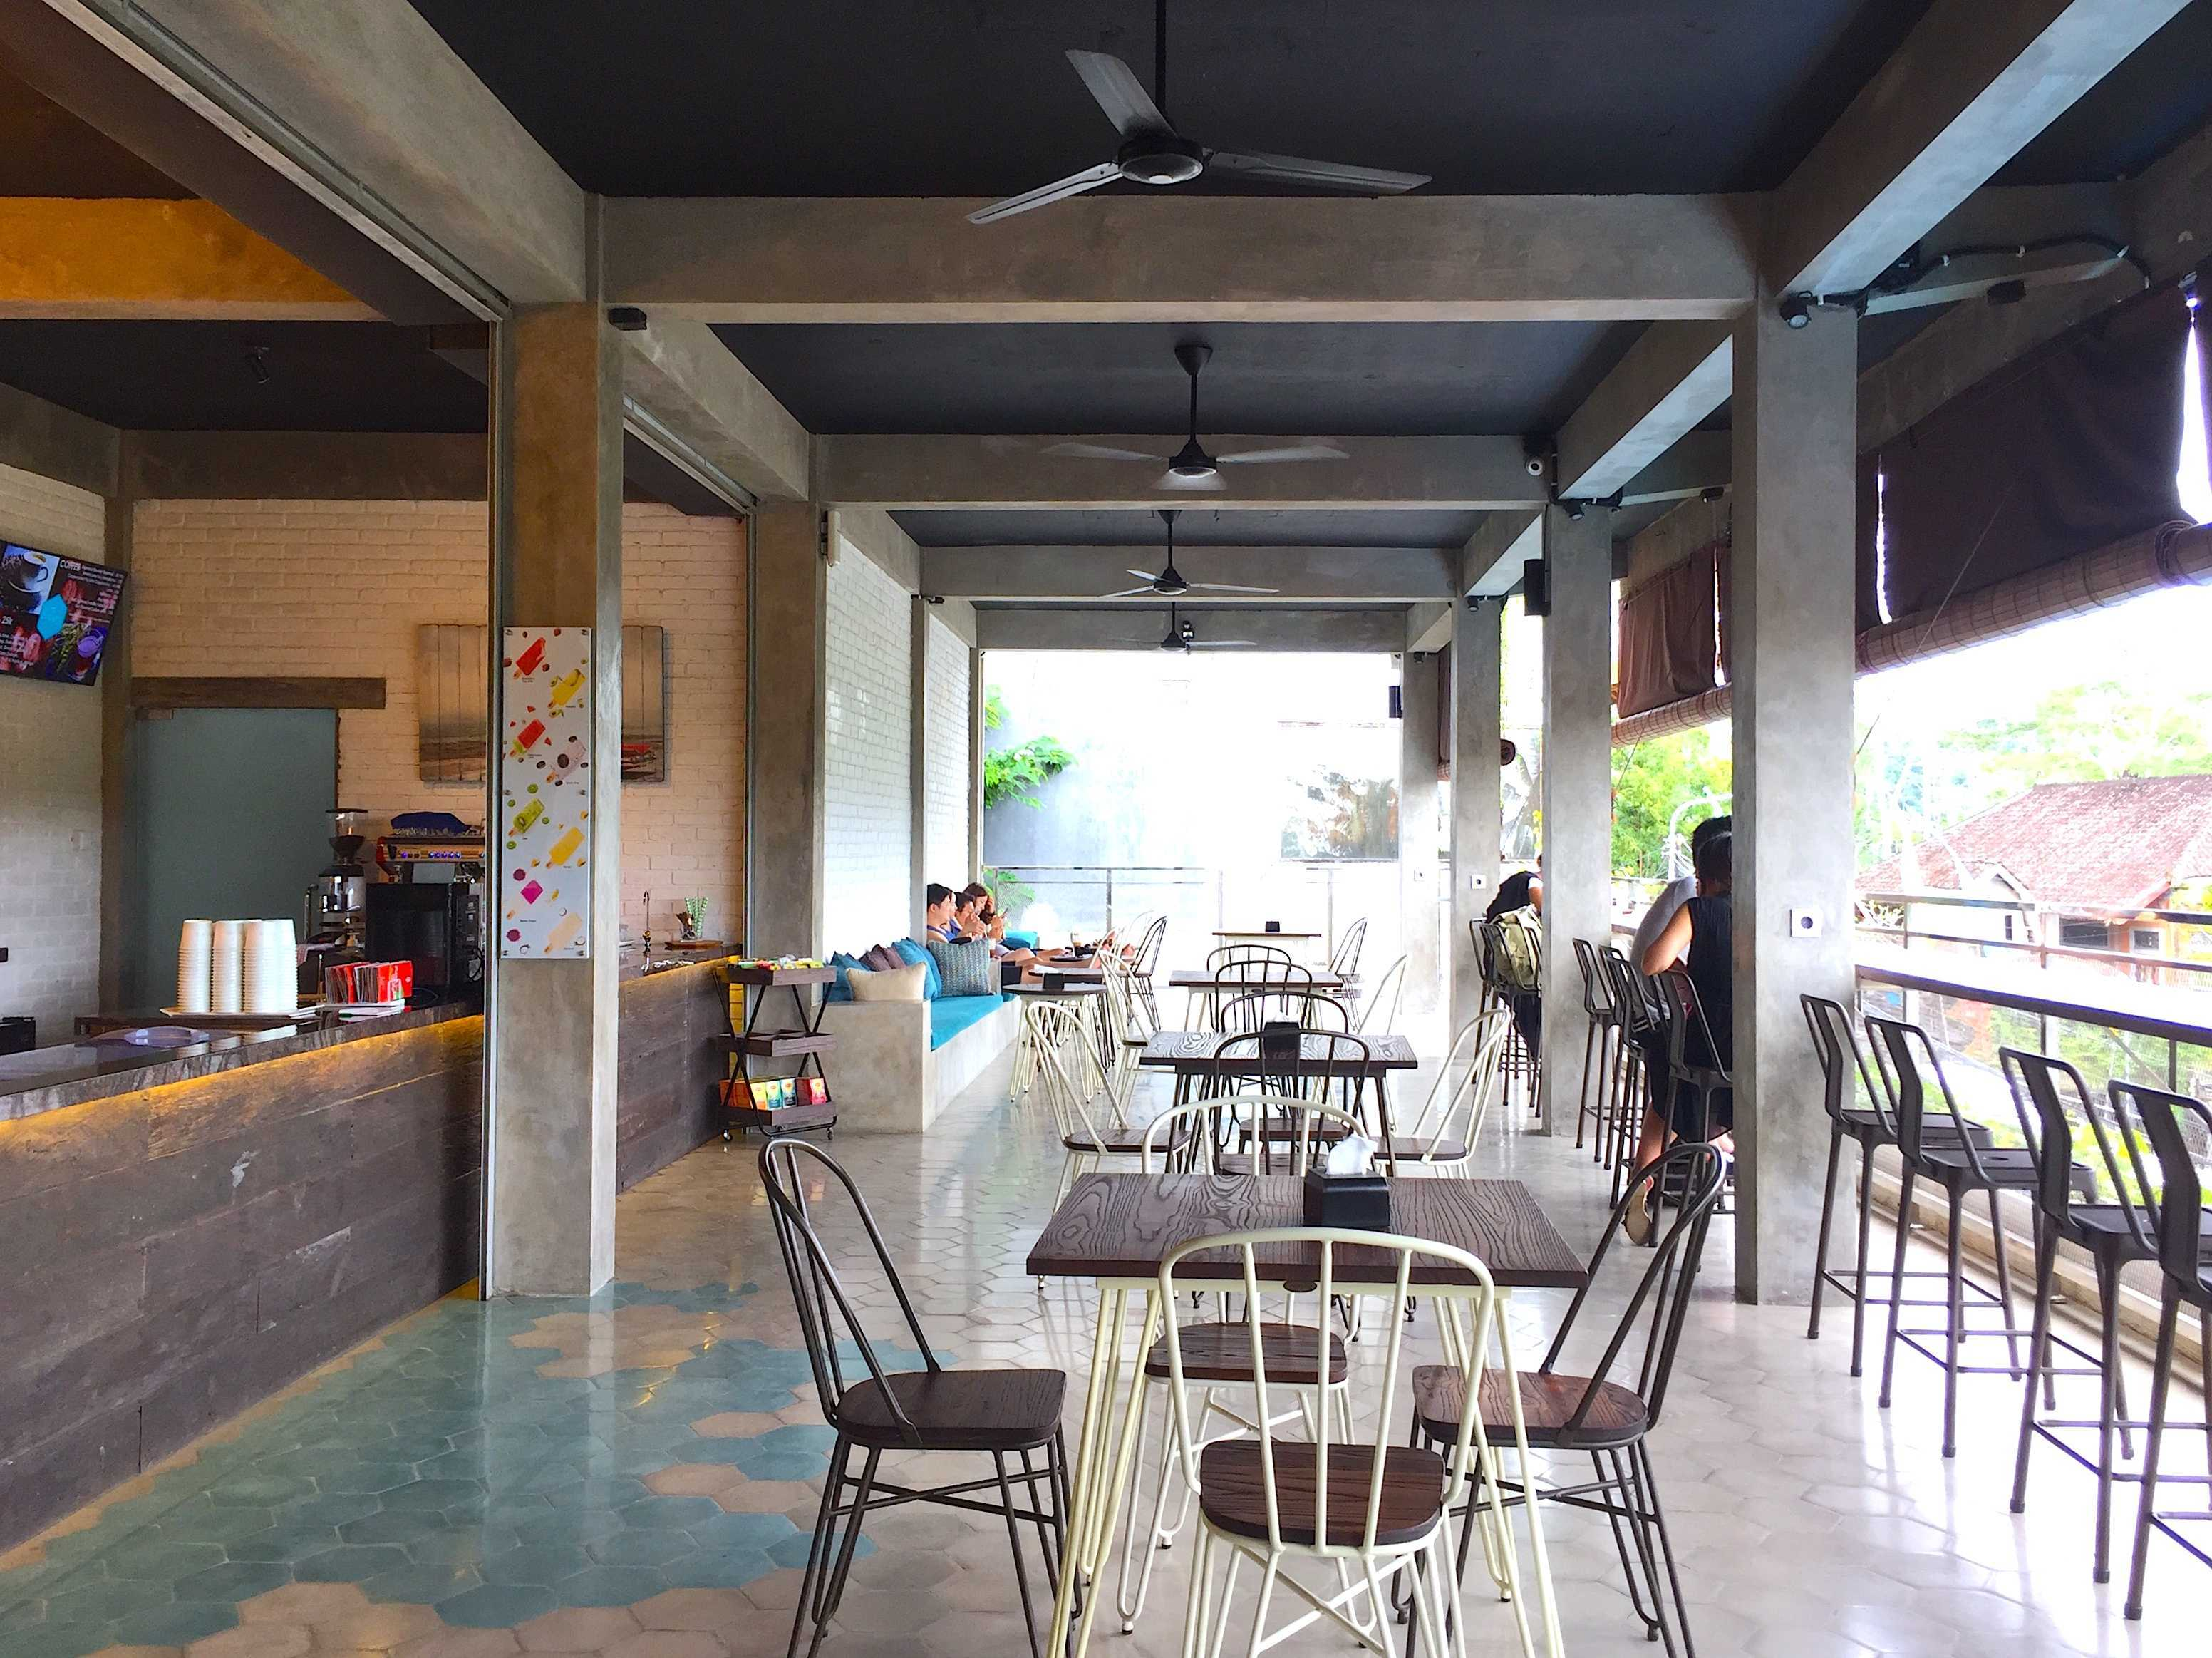 Studio Asri By-Gelato Cafe Tegallalang, Kabupaten Gianyar, Bali, Indonesia Tegallalang, Kabupaten Gianyar, Bali, Indonesia Studio-Asri-By-Gelato-Cafe   58858